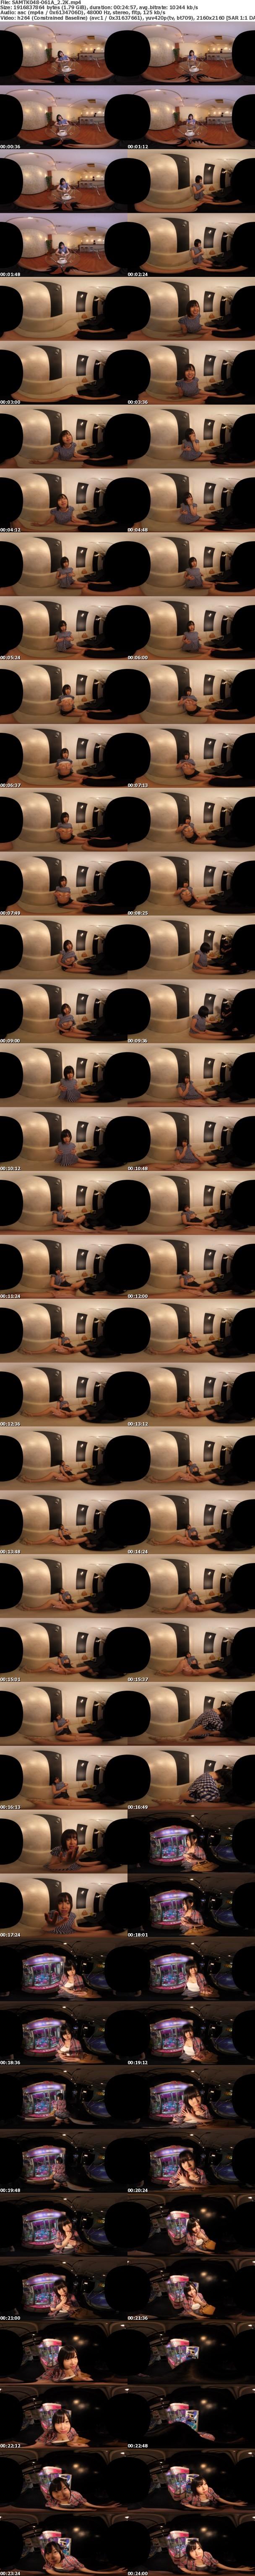 VR/3D SAMTK048-061 【ストーリー再生VR】 桜川かなこと付き合う夢の学生生活【デート編】